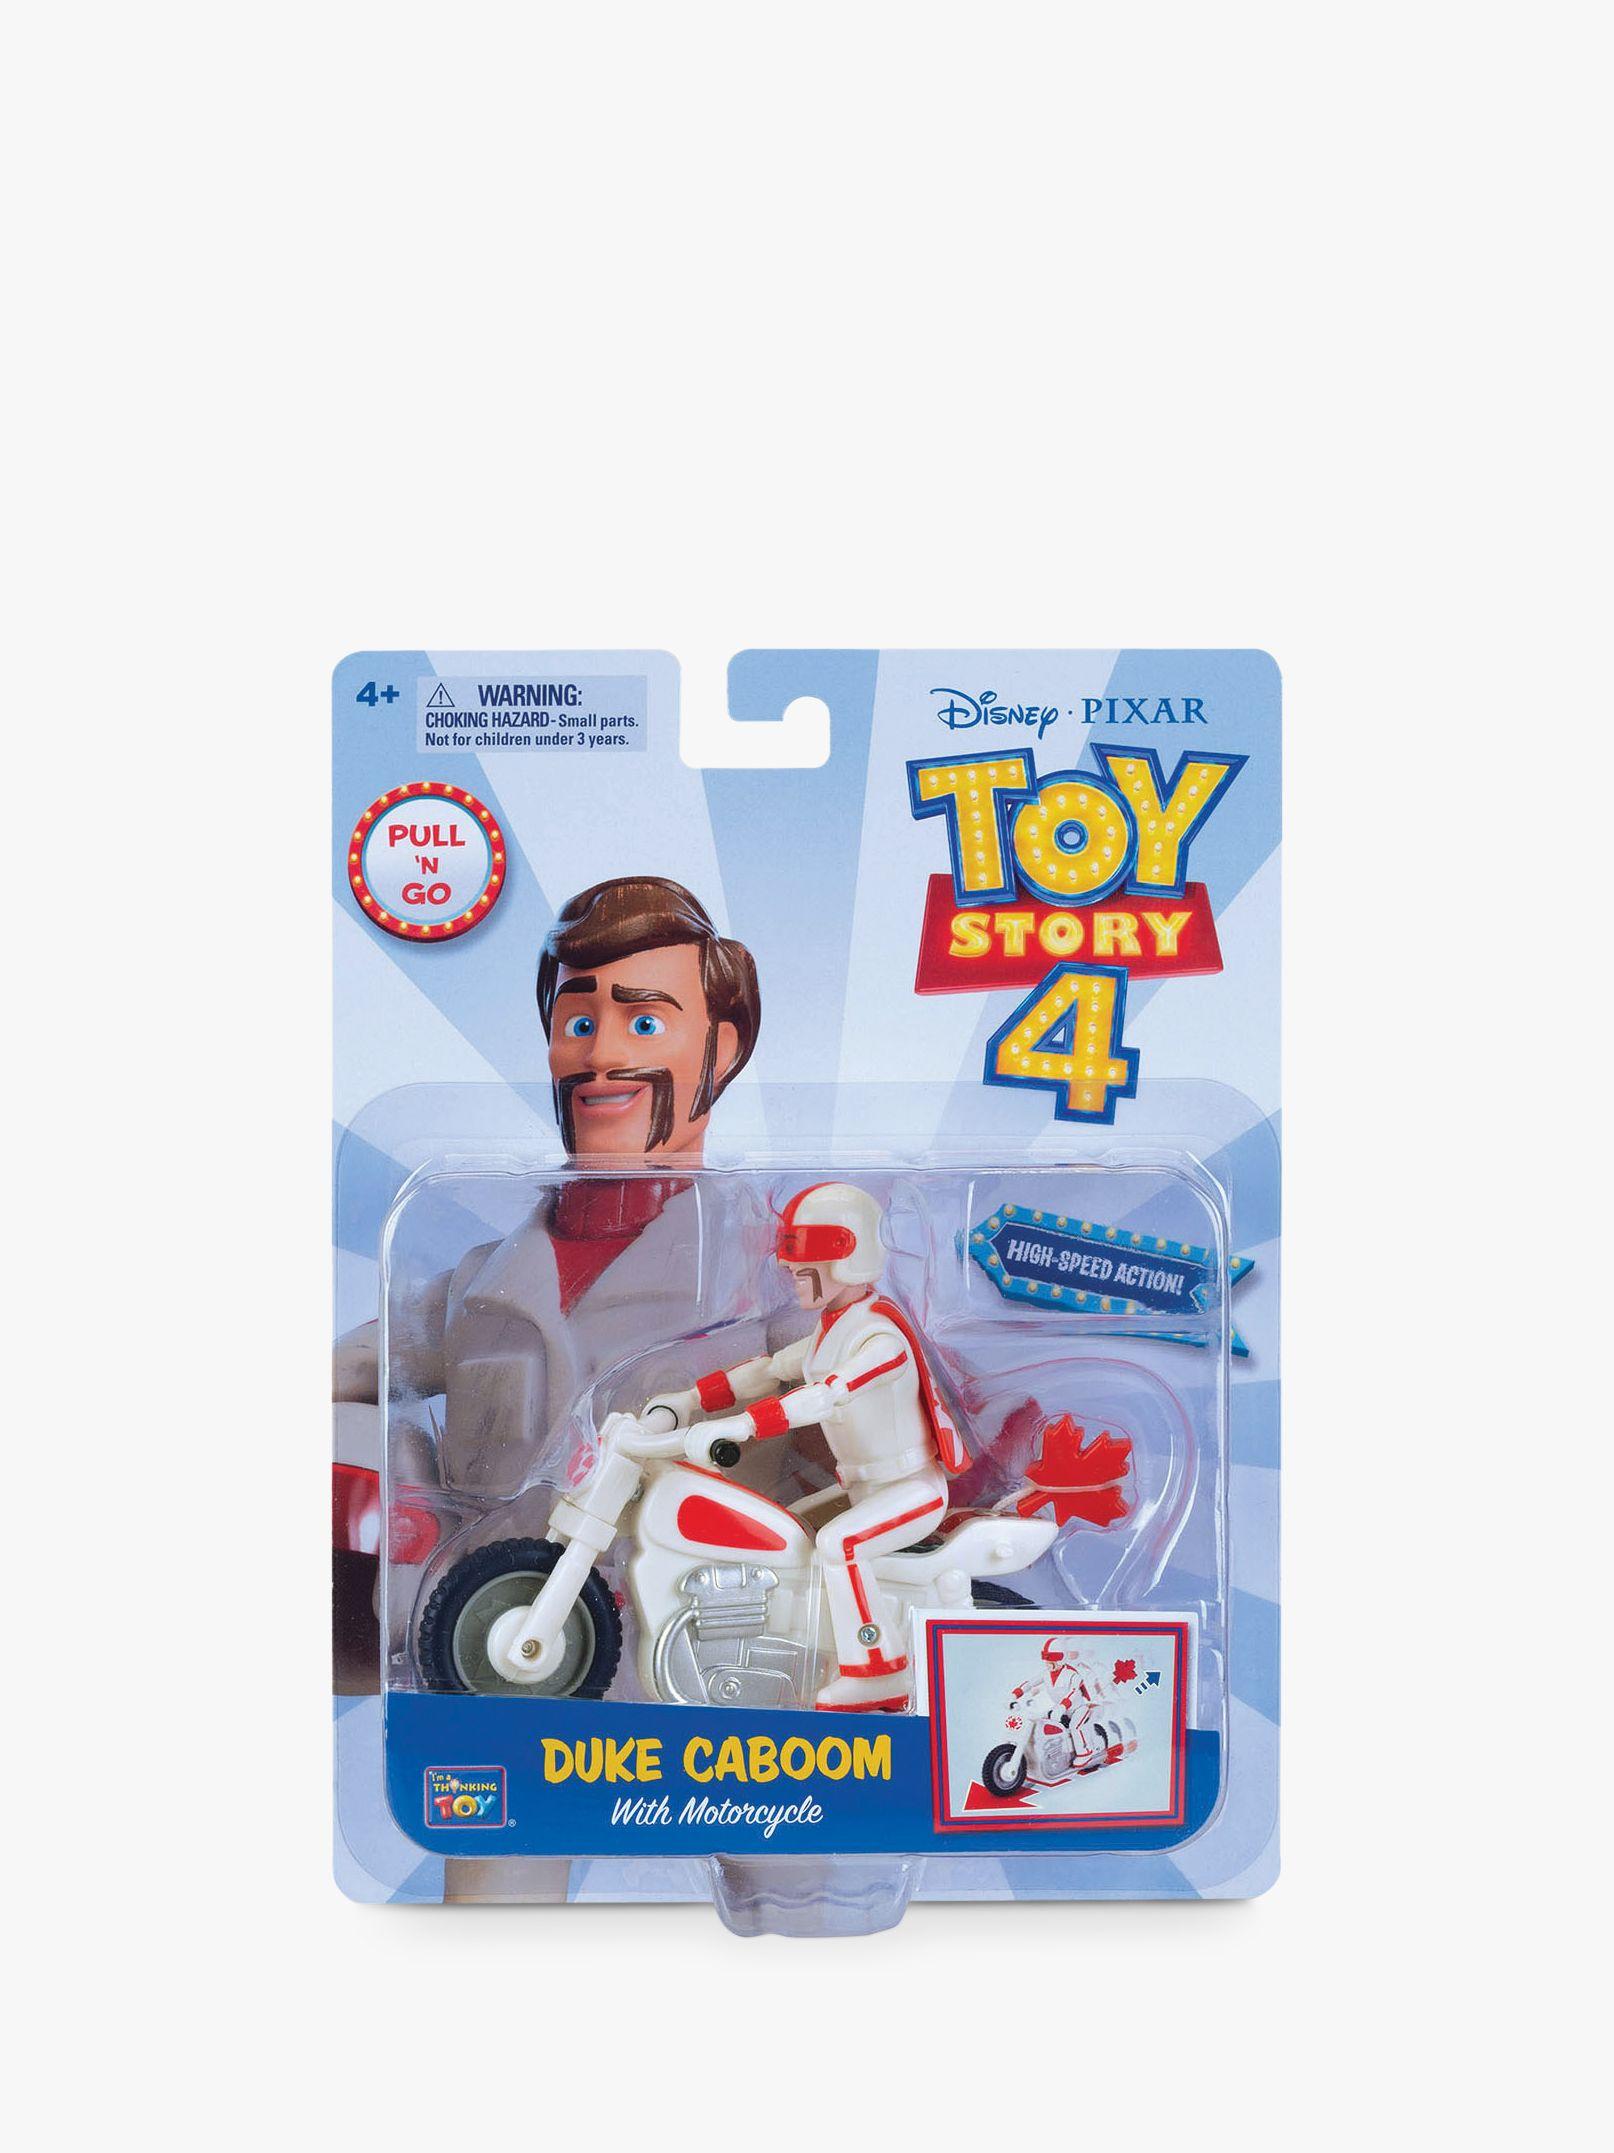 Disney Disney Pixar Toy Story 4 Duke Caboom Toy